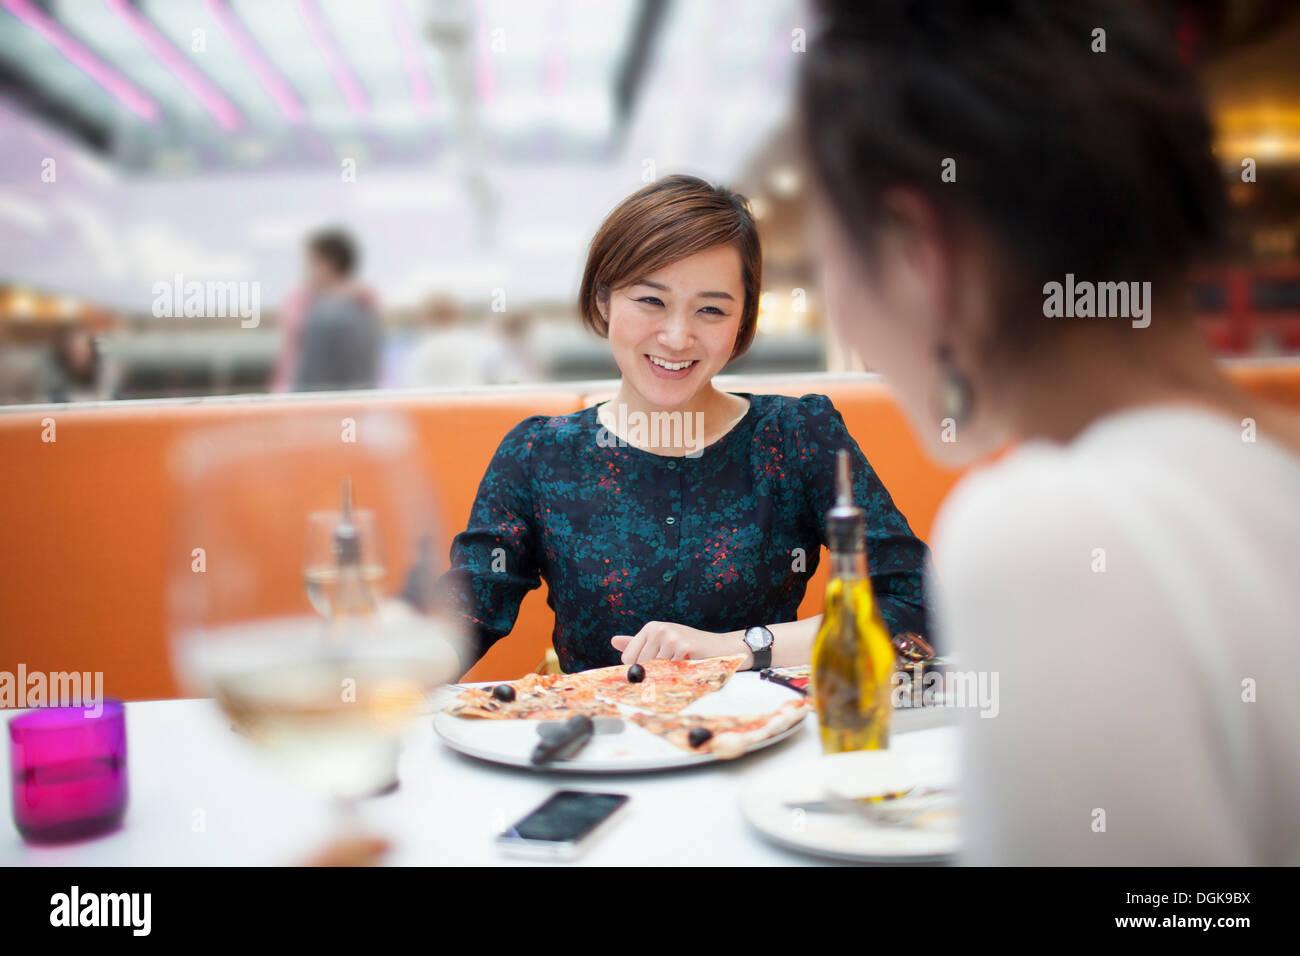 Young women enjoying meal in restaurant Stock Photo